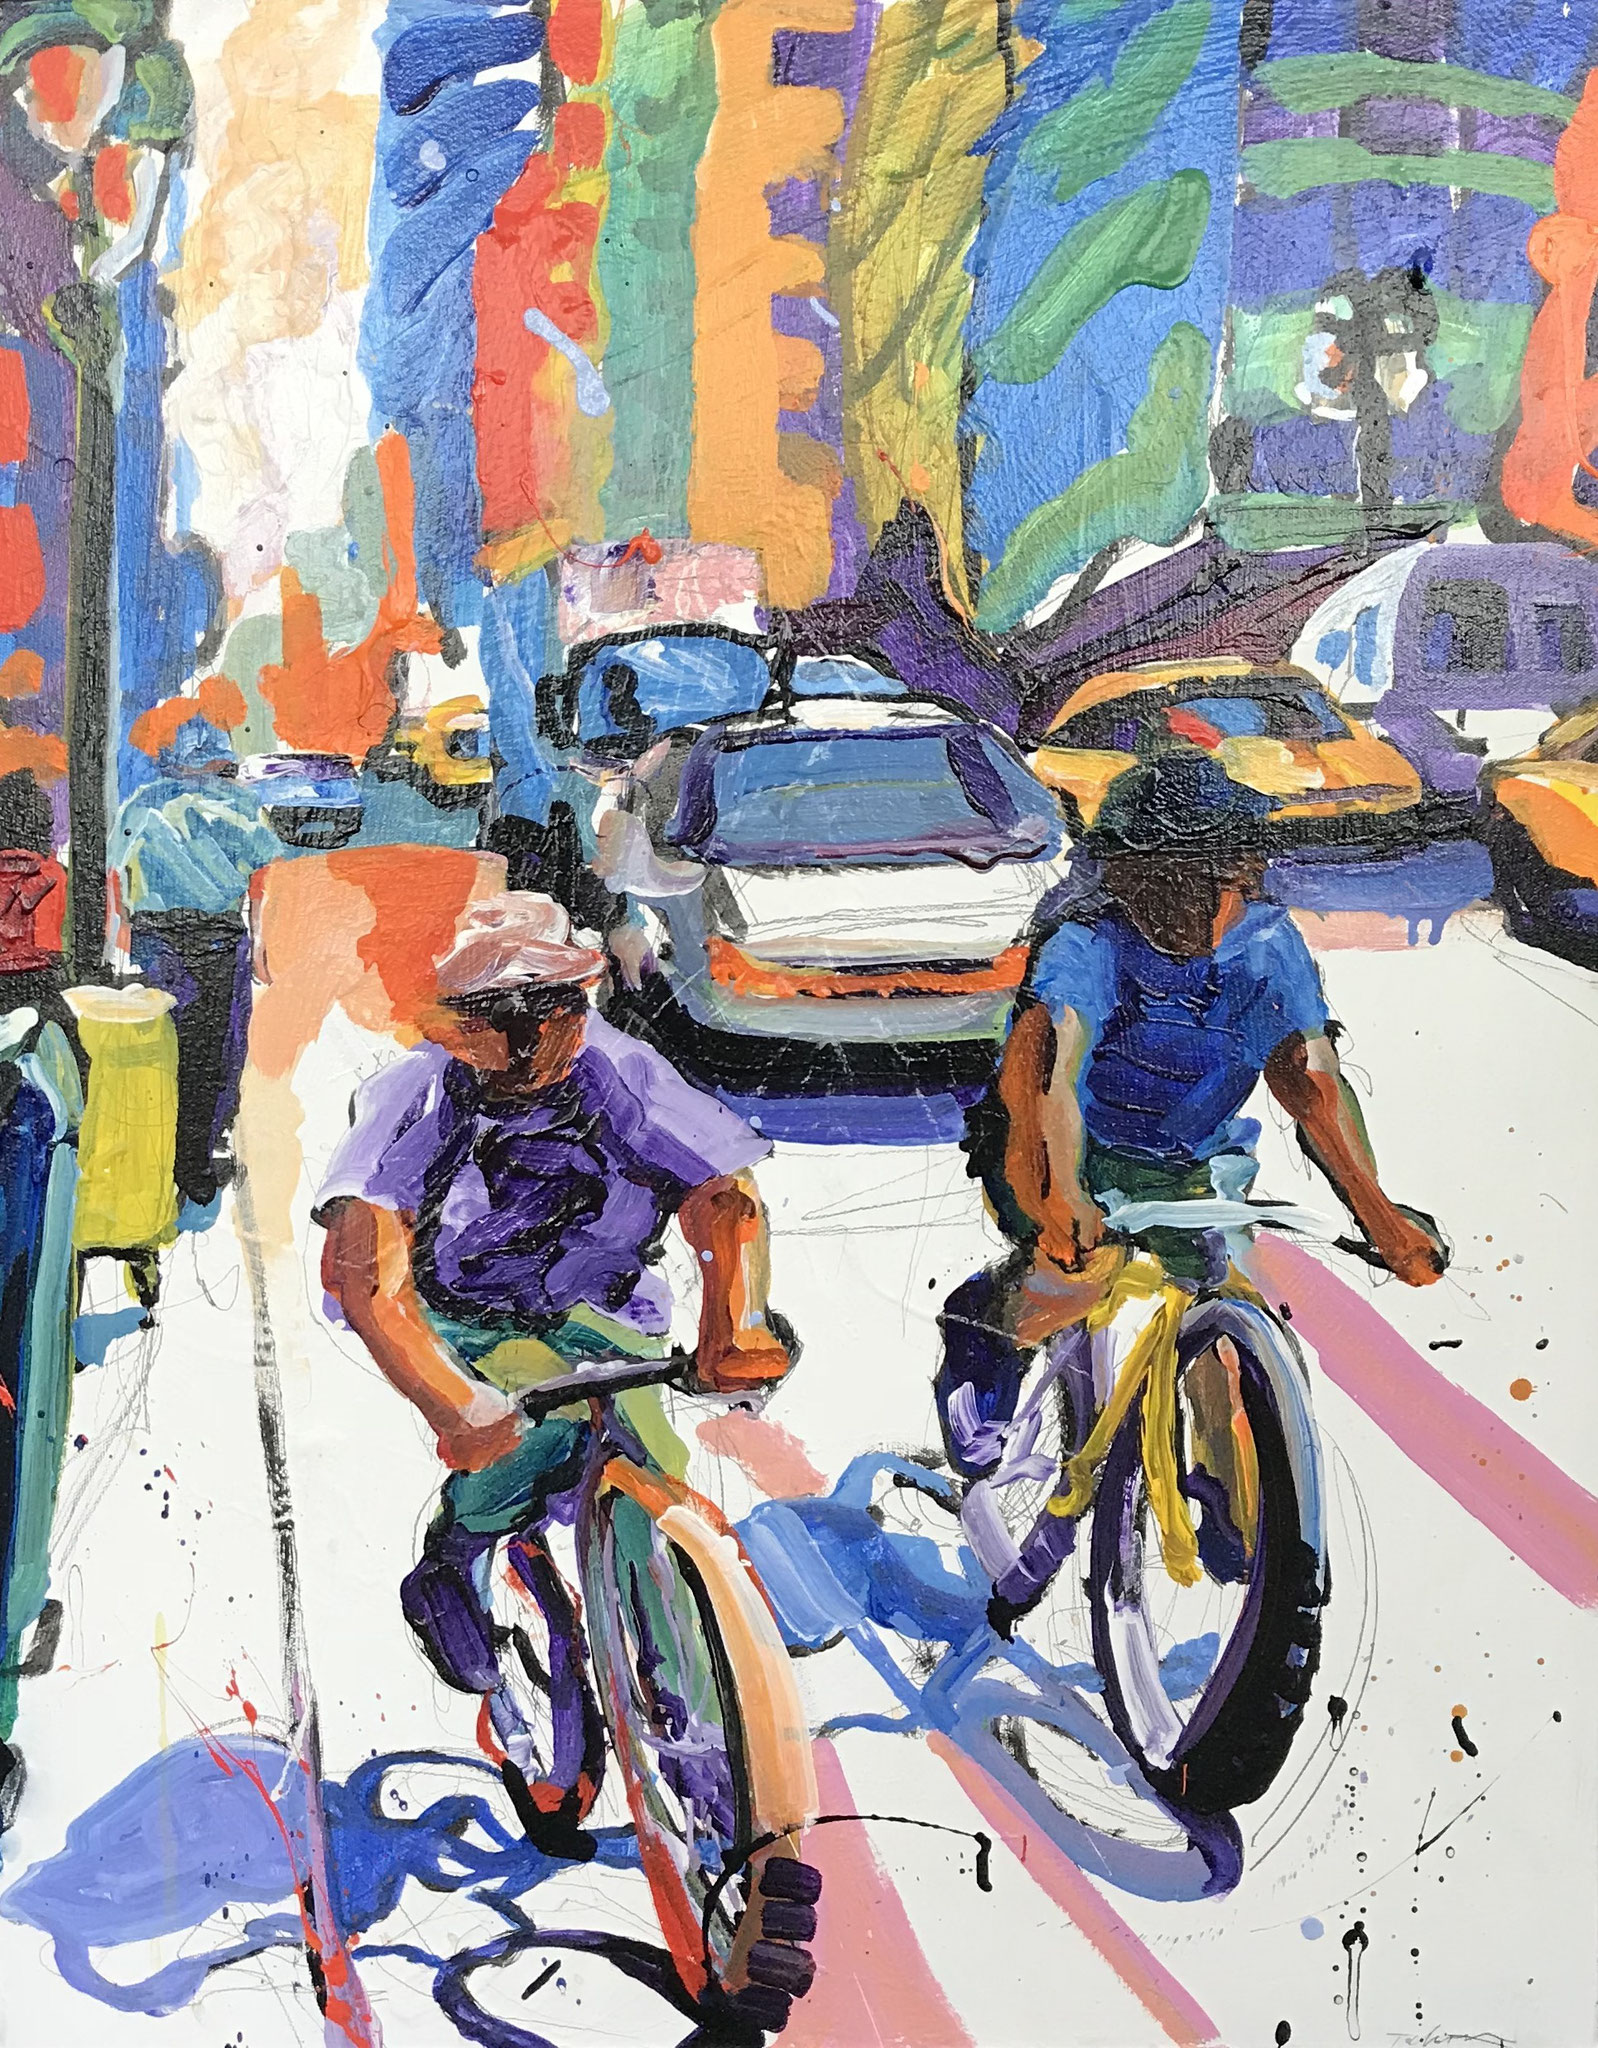 Tom Christopher A Ride Downtown 2003 Acryl auf Leinwand 76 x 61 cm 8.500,00 € (reg. 11.000,00 €)